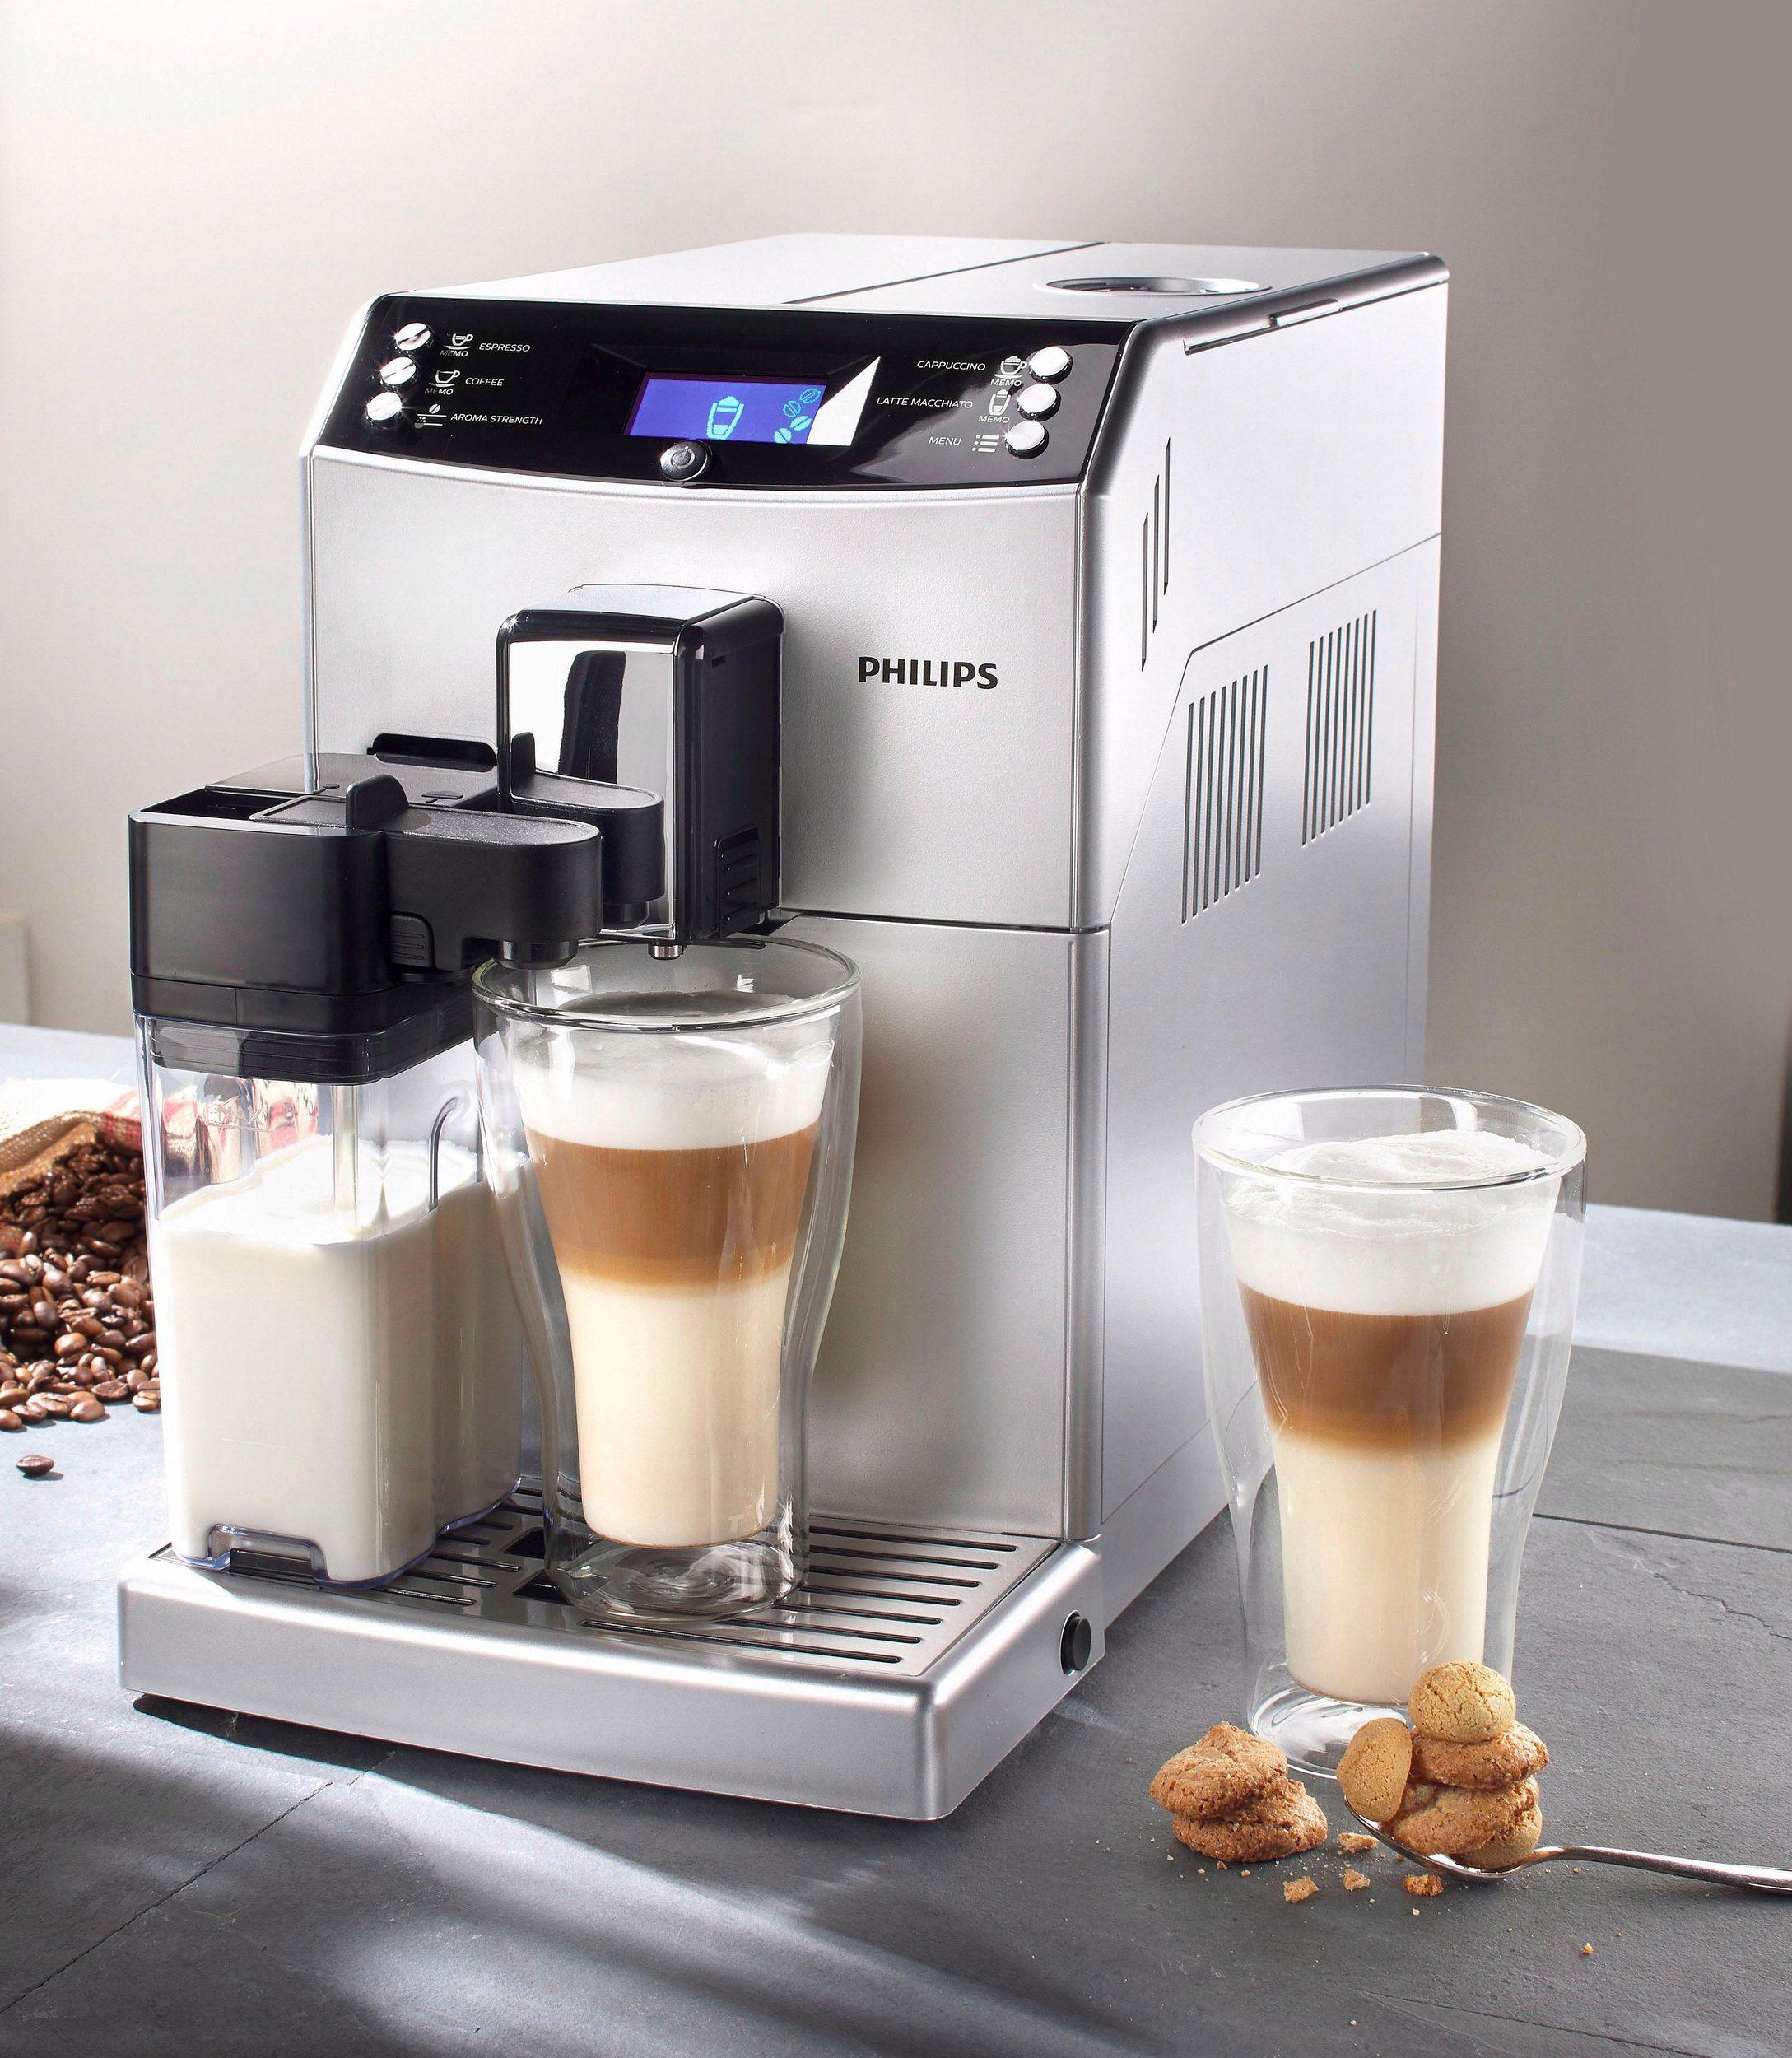 Philips EP3551 espresso machine dominokala 6 1 - اسپرسو ساز فیلیپس EP3551